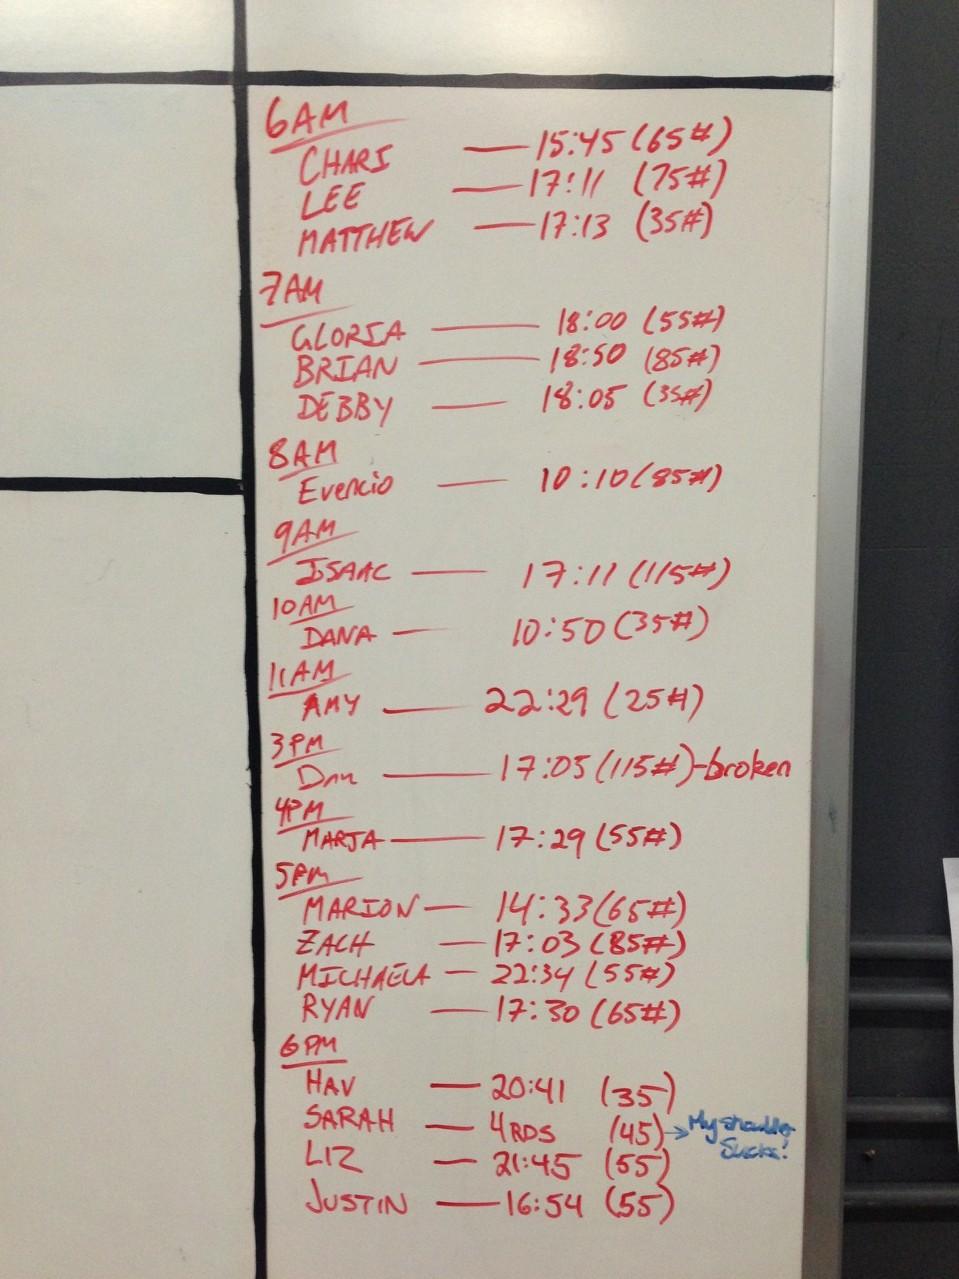 Apr 14 WOD Results